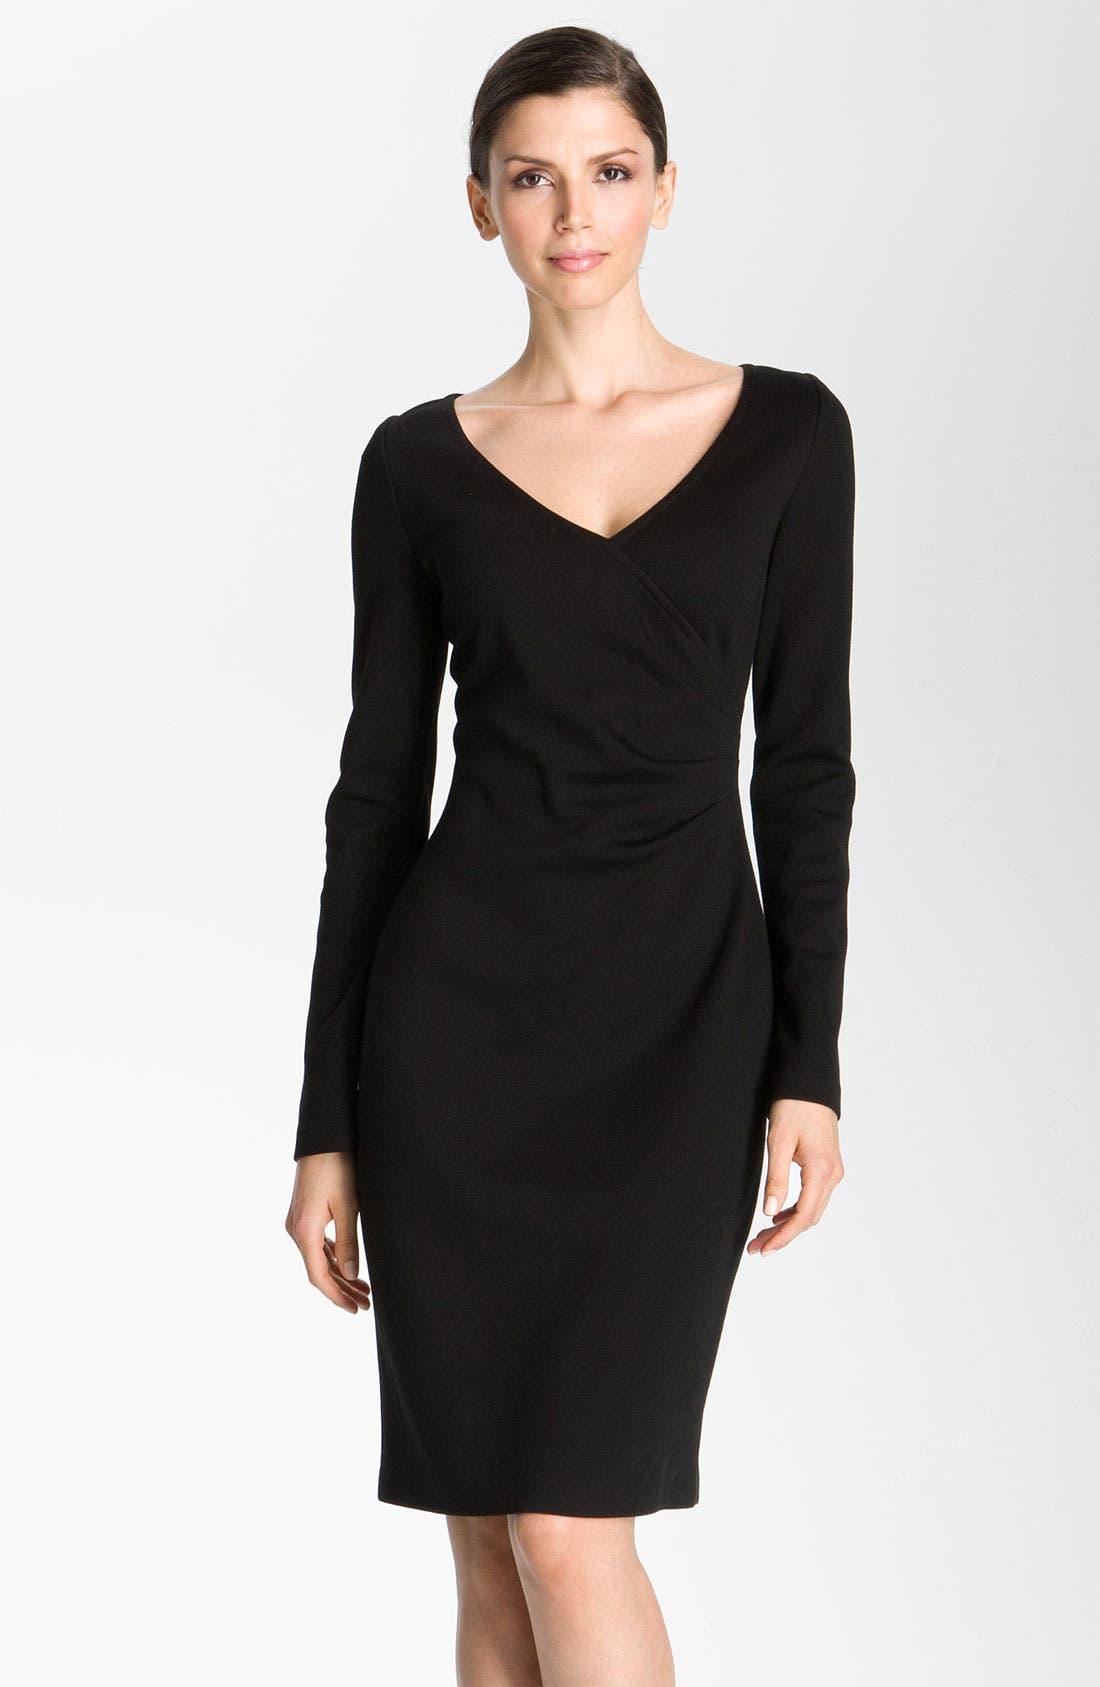 Main Image - St. John Collection Milano Knit Faux Wrap Dress